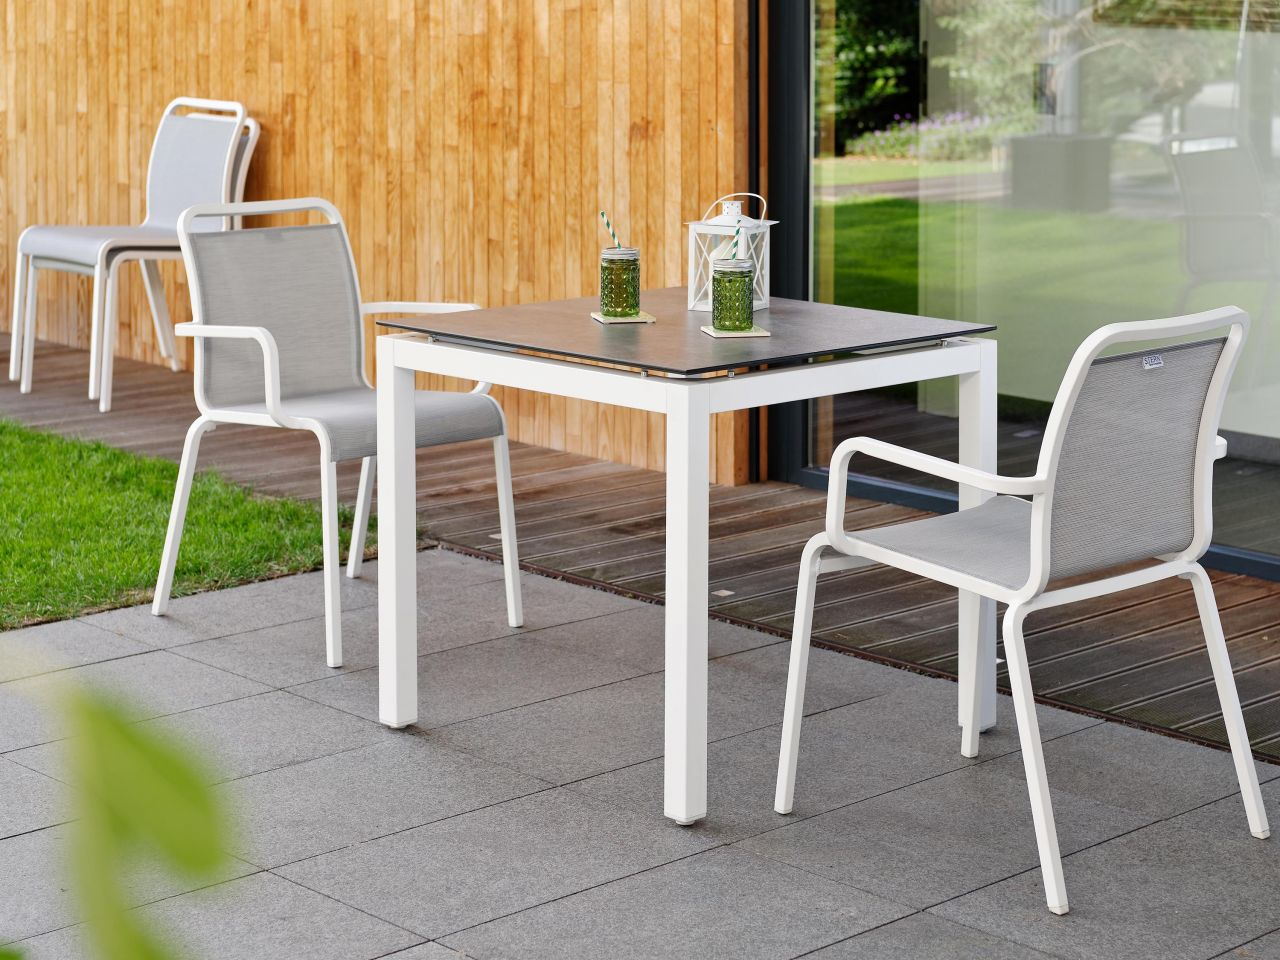 stern gartentisch 80x80cm aluminium wei silverstar 2 0 gartenm bel l nse. Black Bedroom Furniture Sets. Home Design Ideas